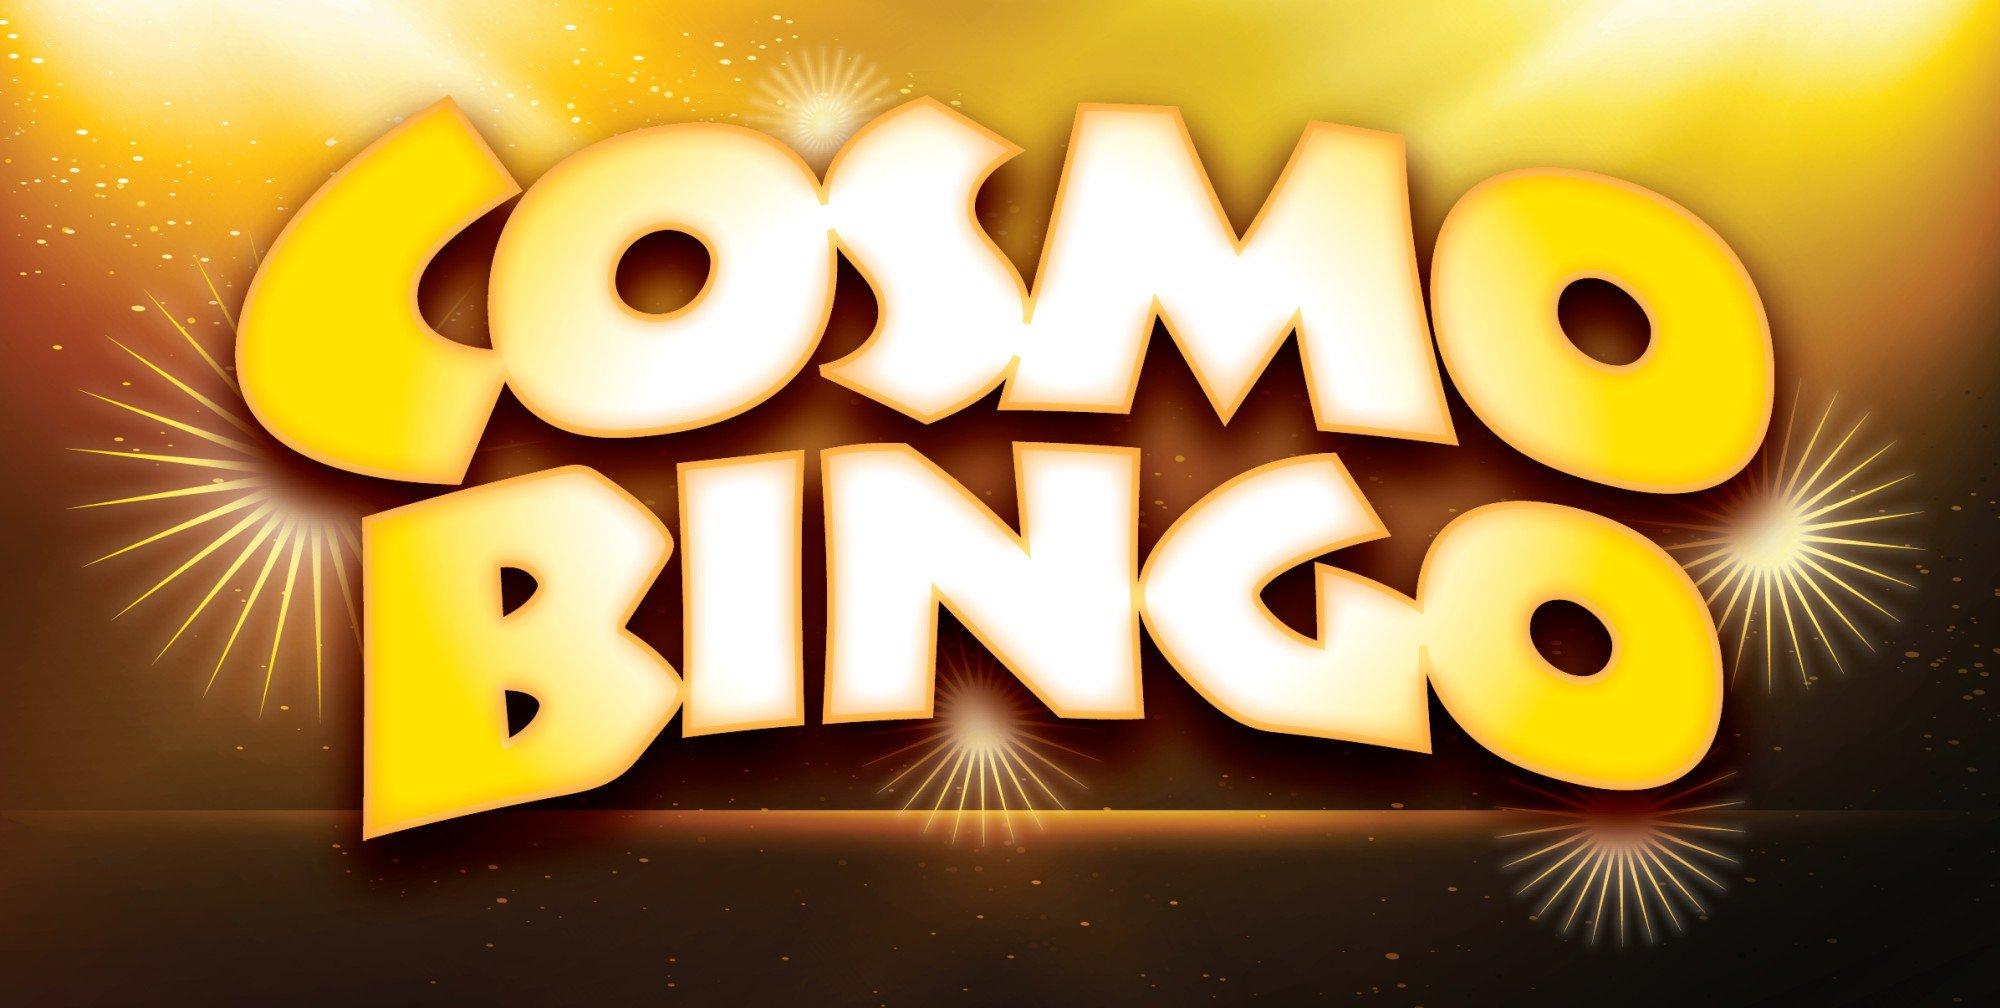 April Cosmic Bingo at the Island Resort & Casino